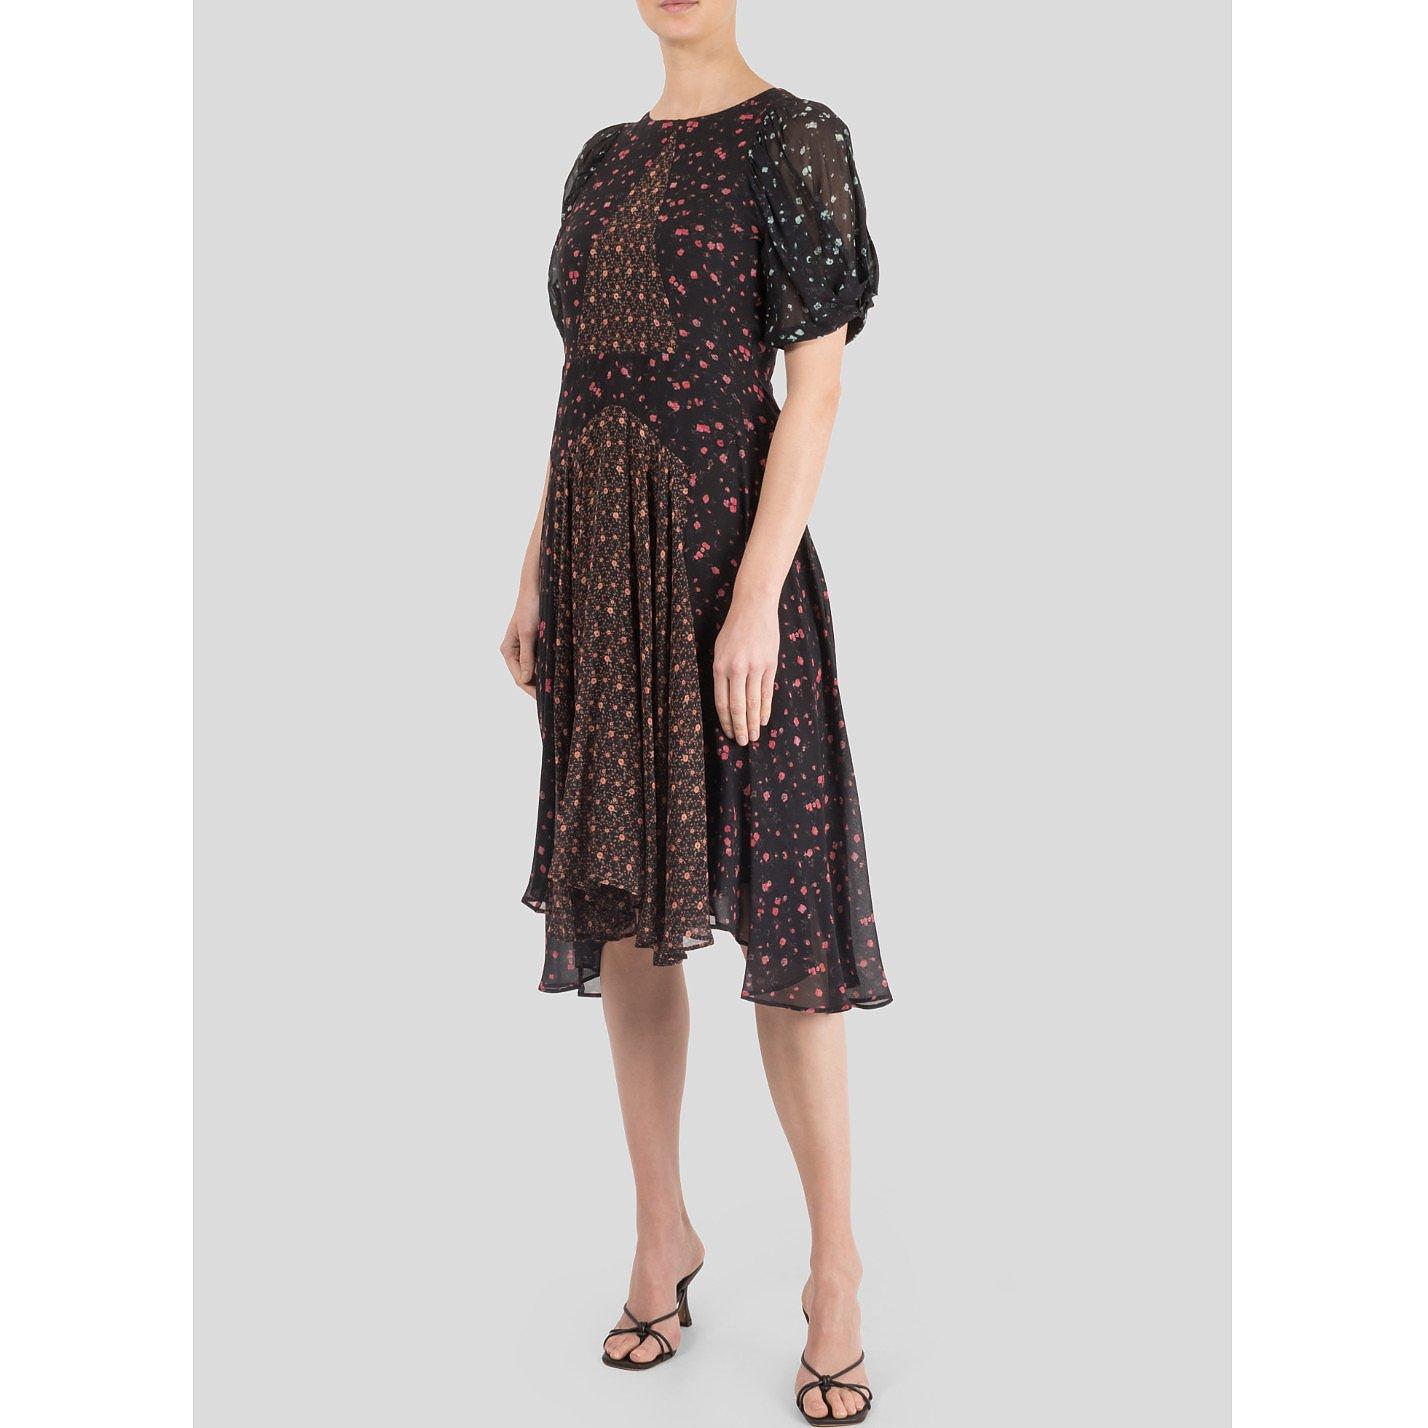 MASSCOB Floral Patchwork Midi Dress